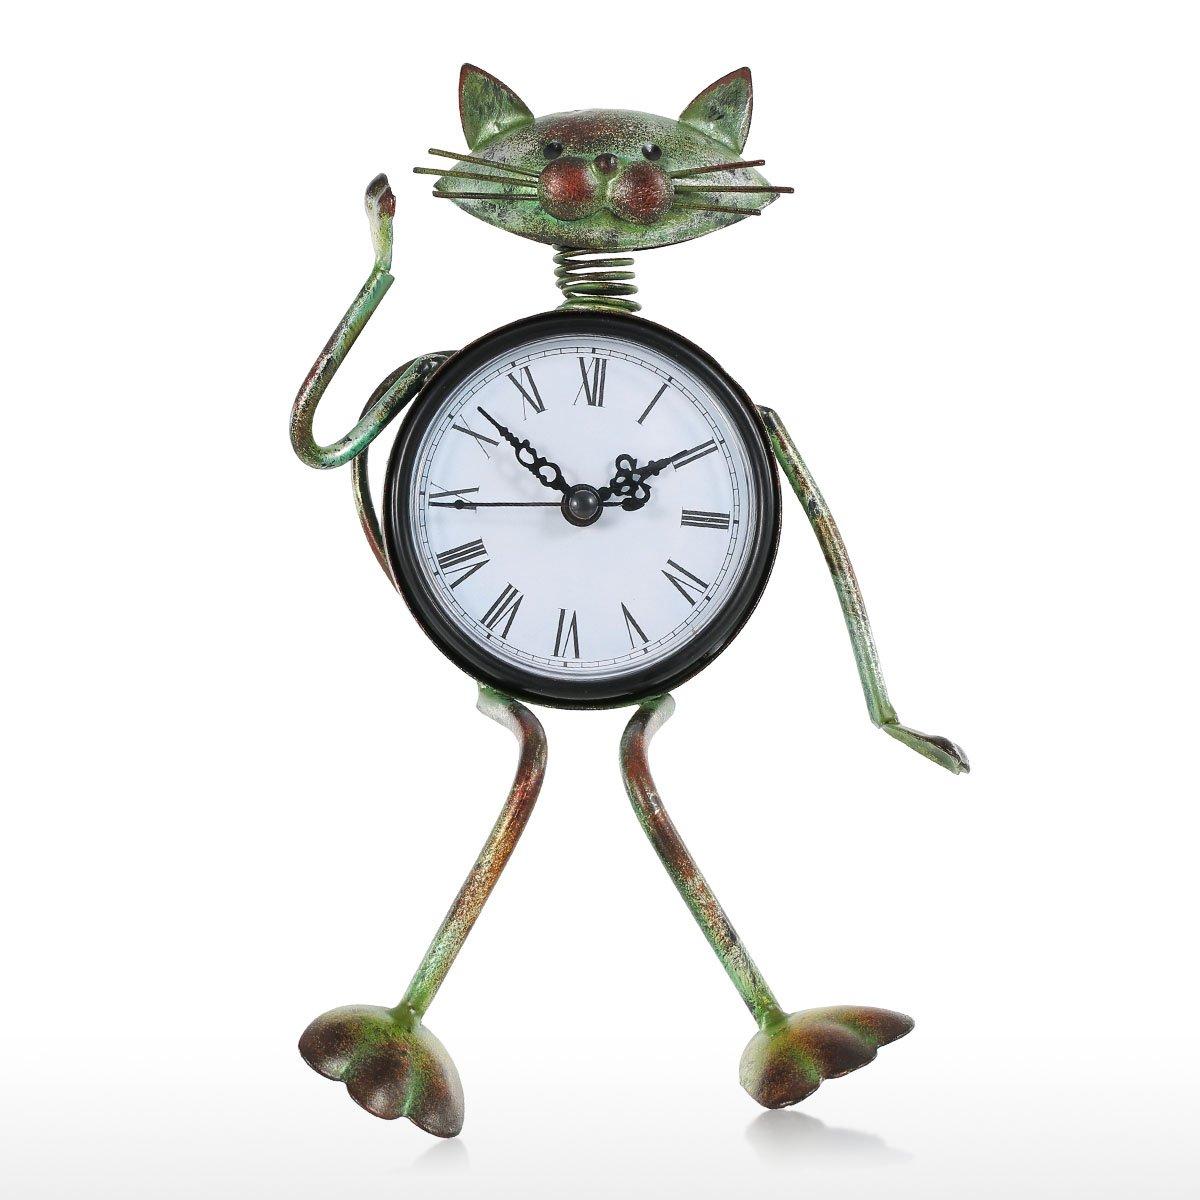 Tooarts Small Cat Desk Clock Handmade Vintage Metal Cat Figurine Decorative Table Animal Clock